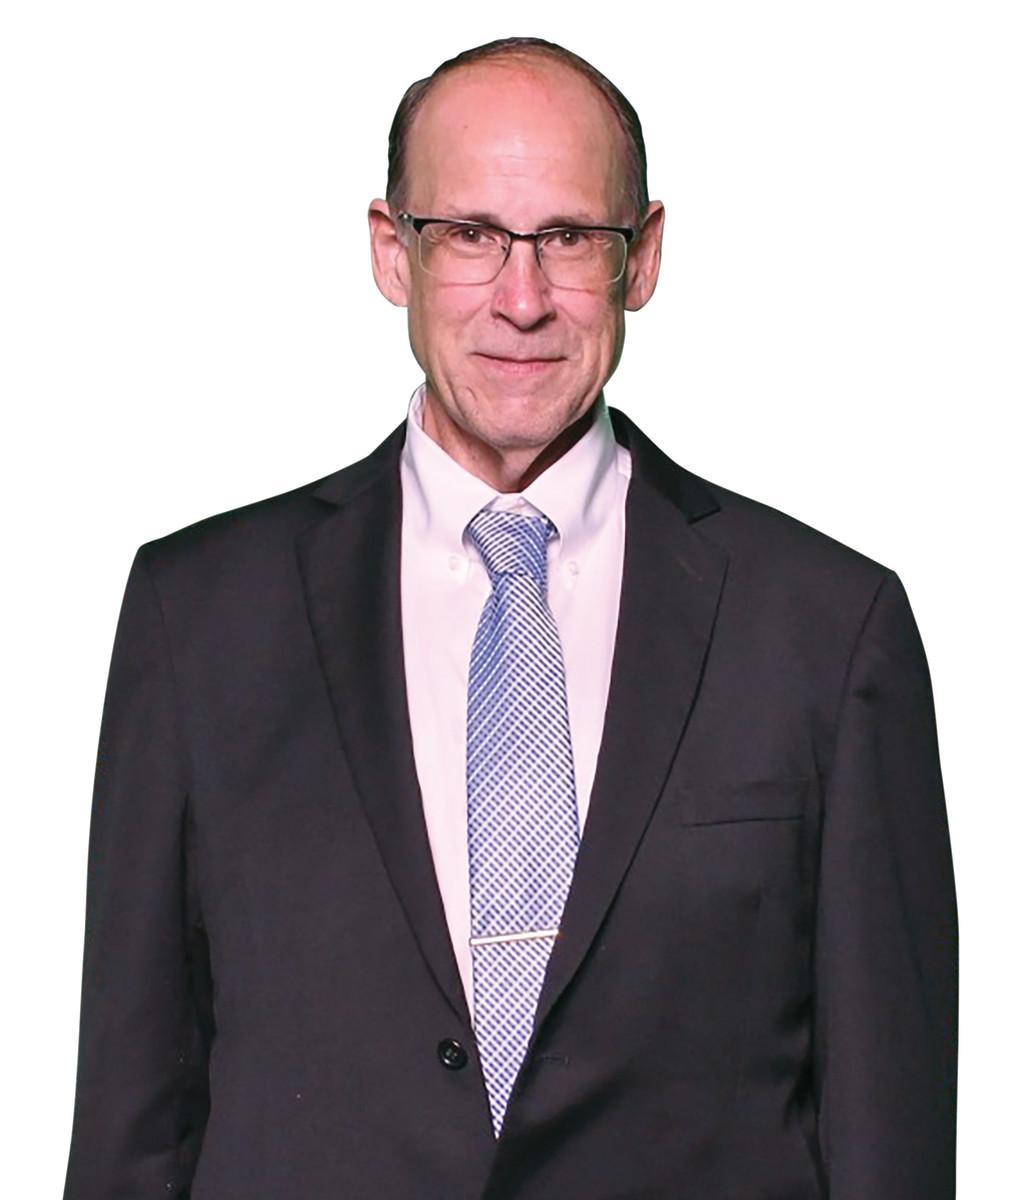 Kenneth Nemec